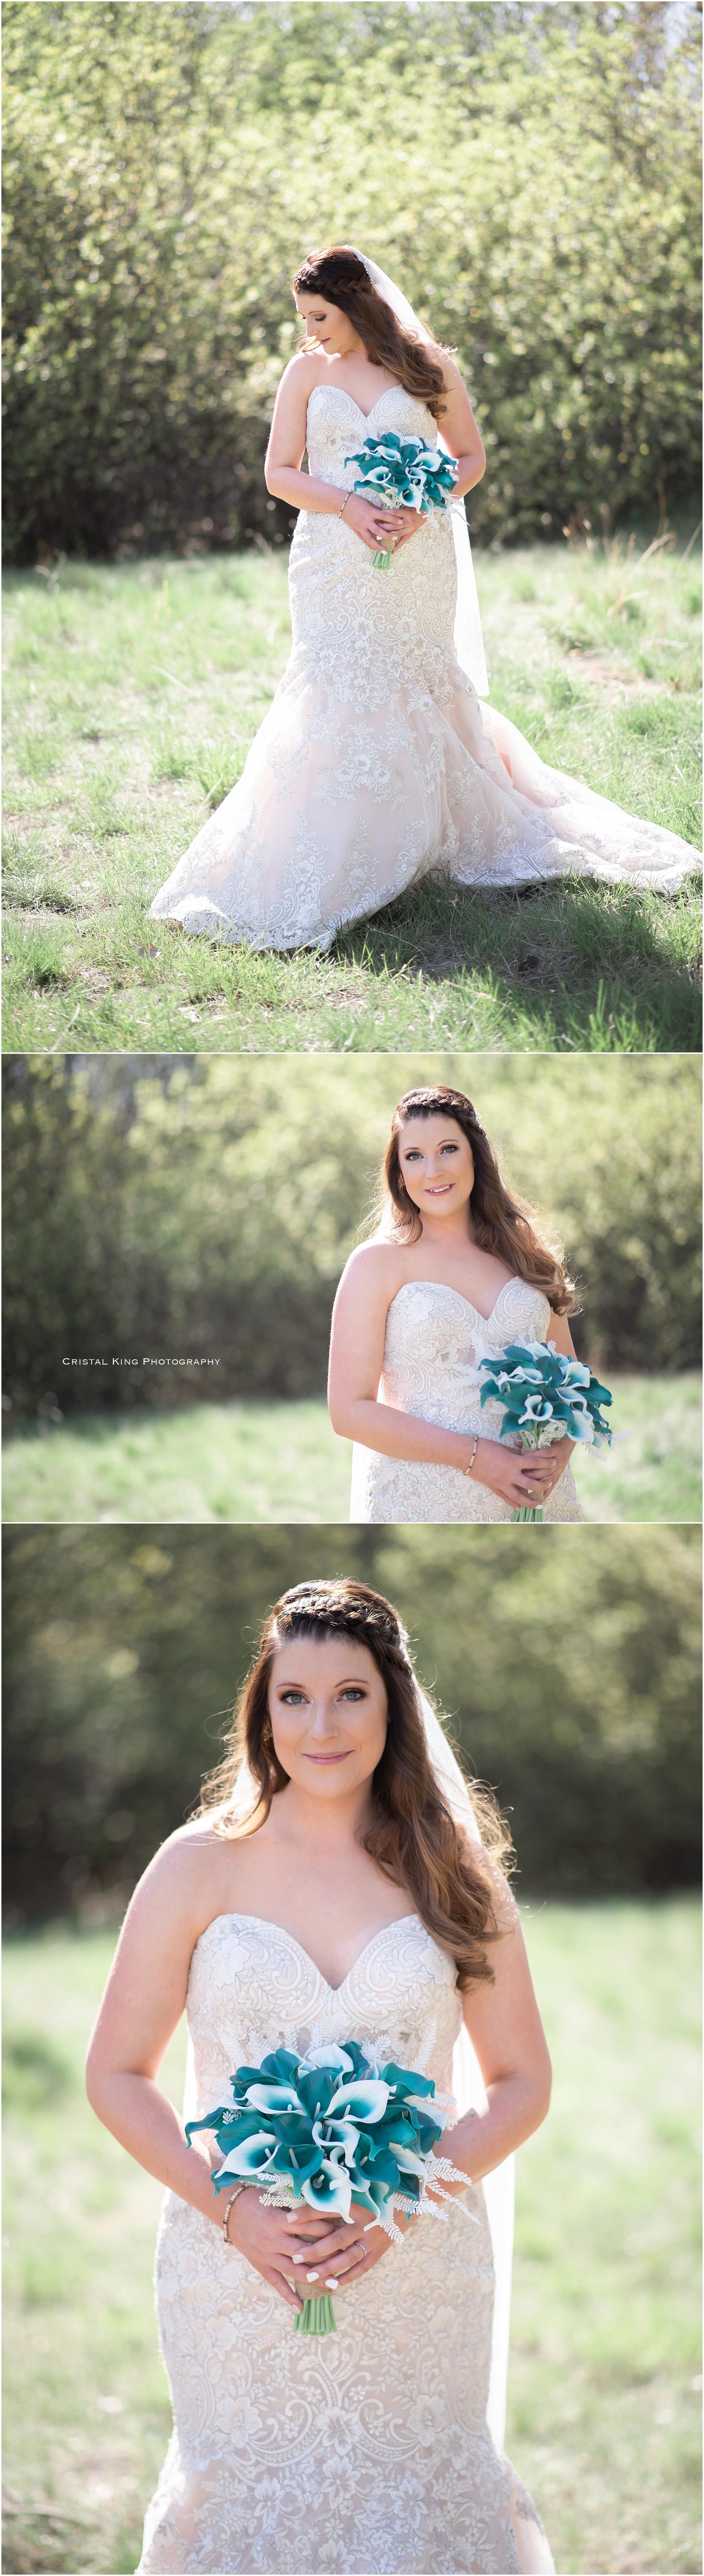 Myla & Grant Wedding-129.jpg